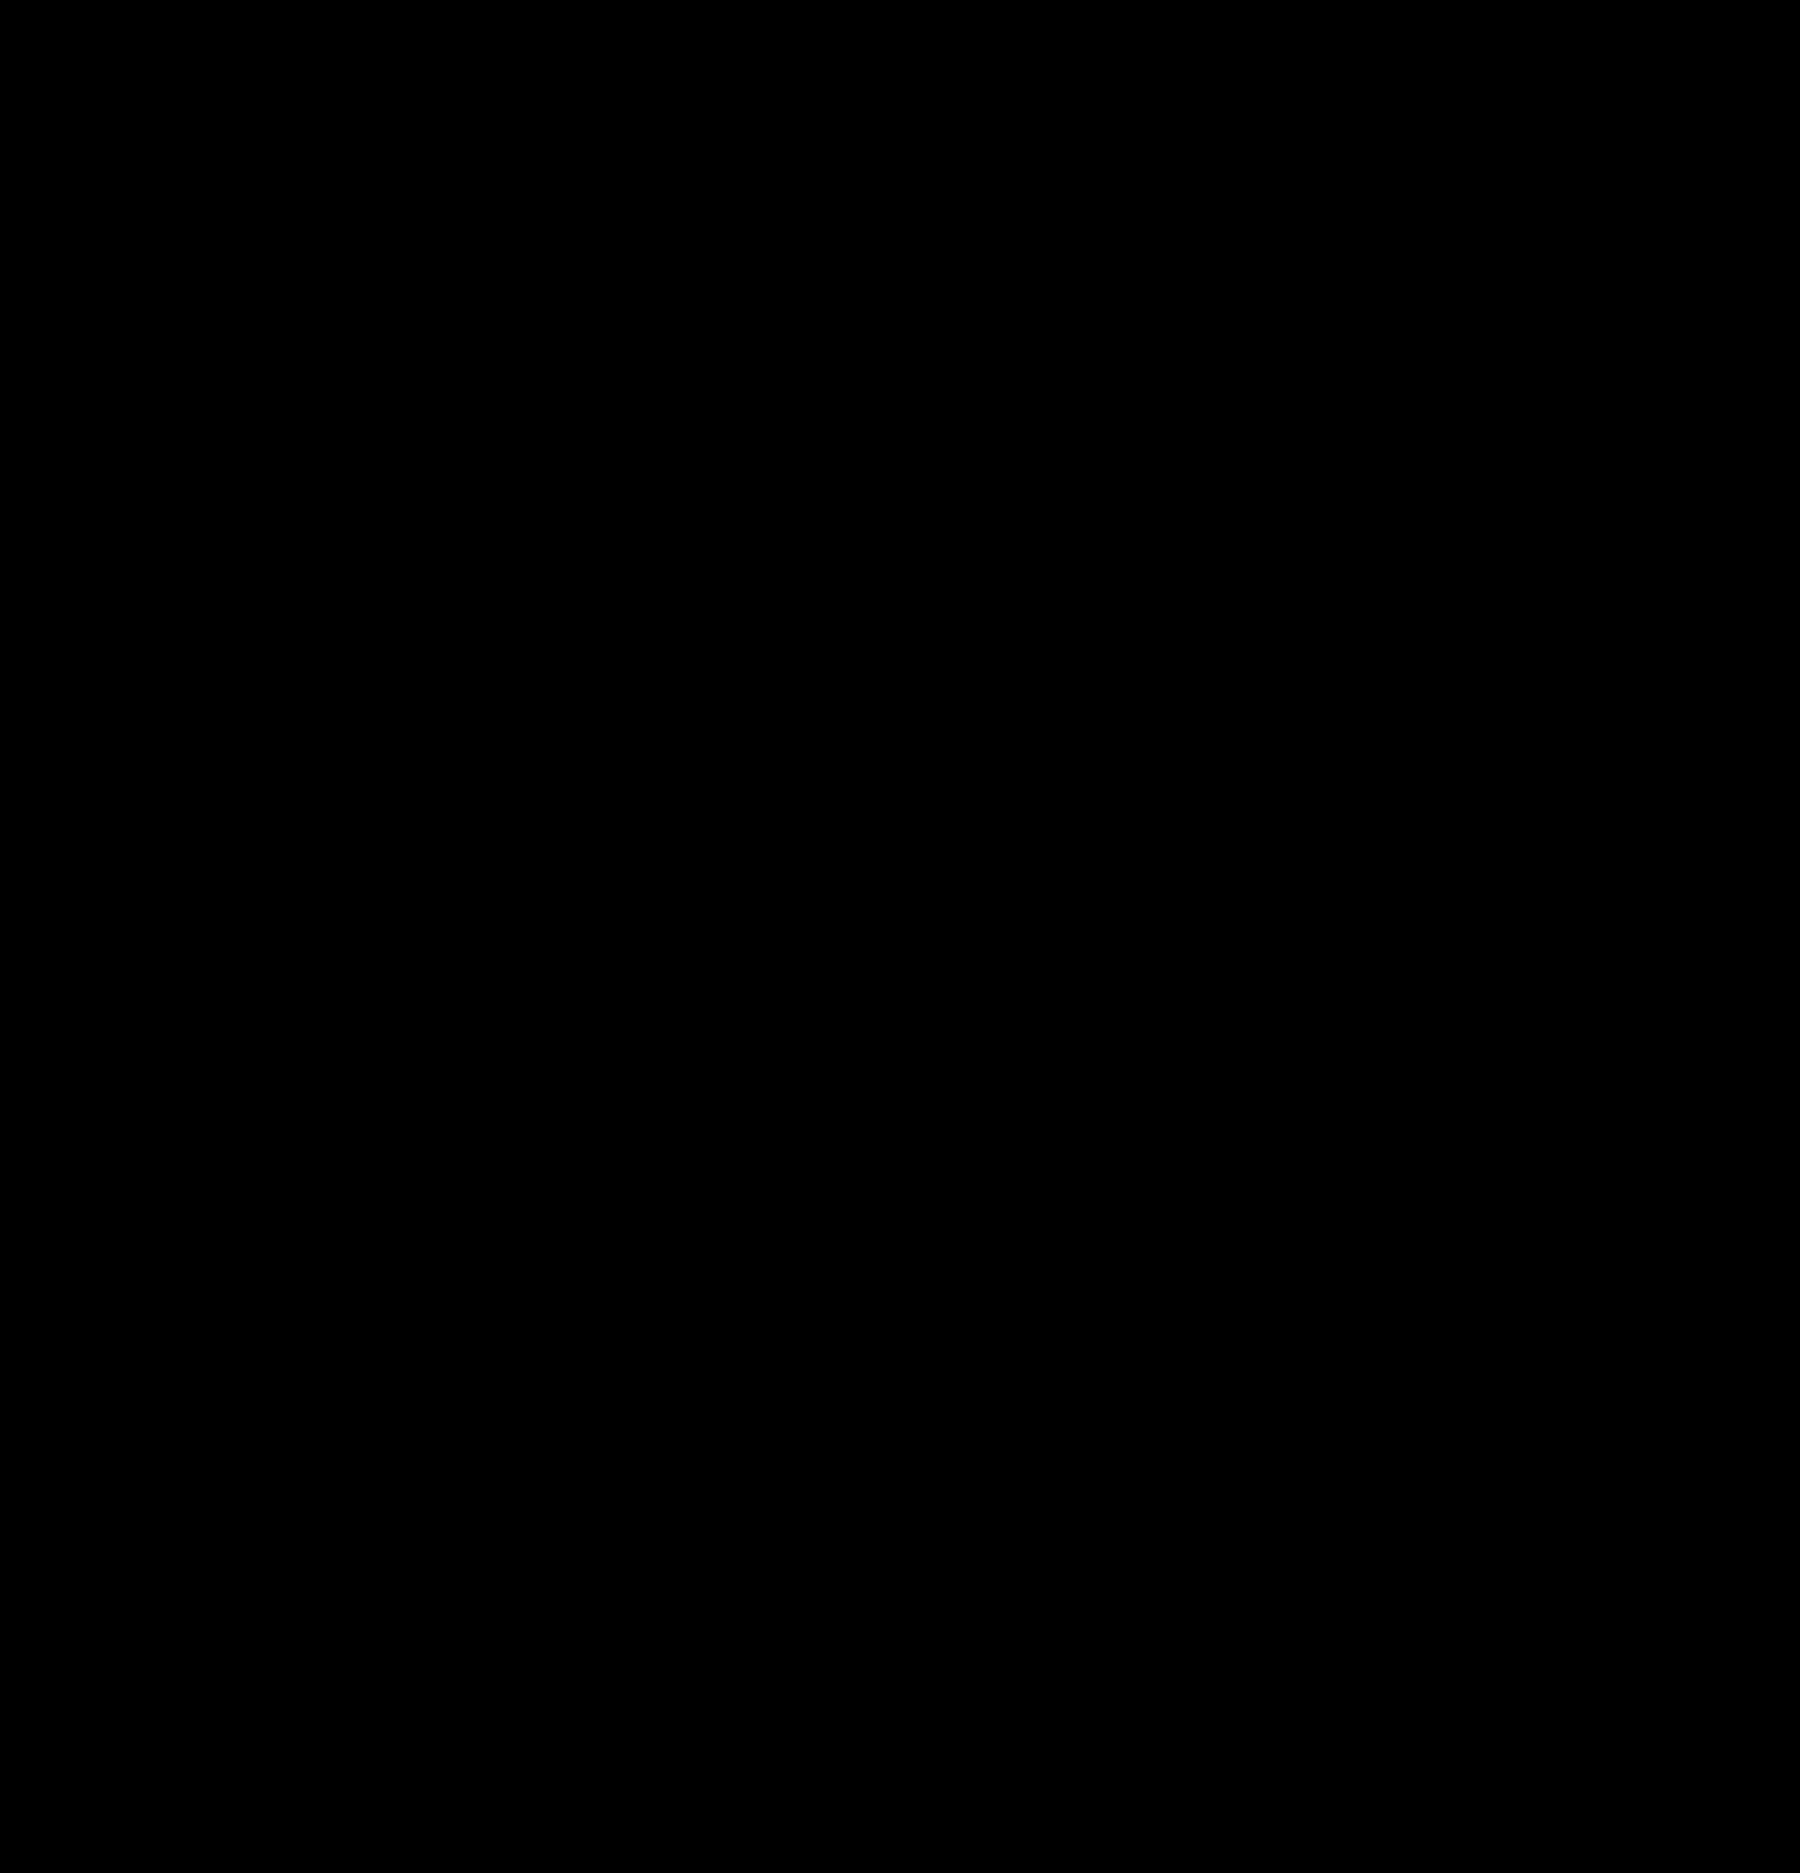 Idea clipart logo vector. Solar eclipse window tinting